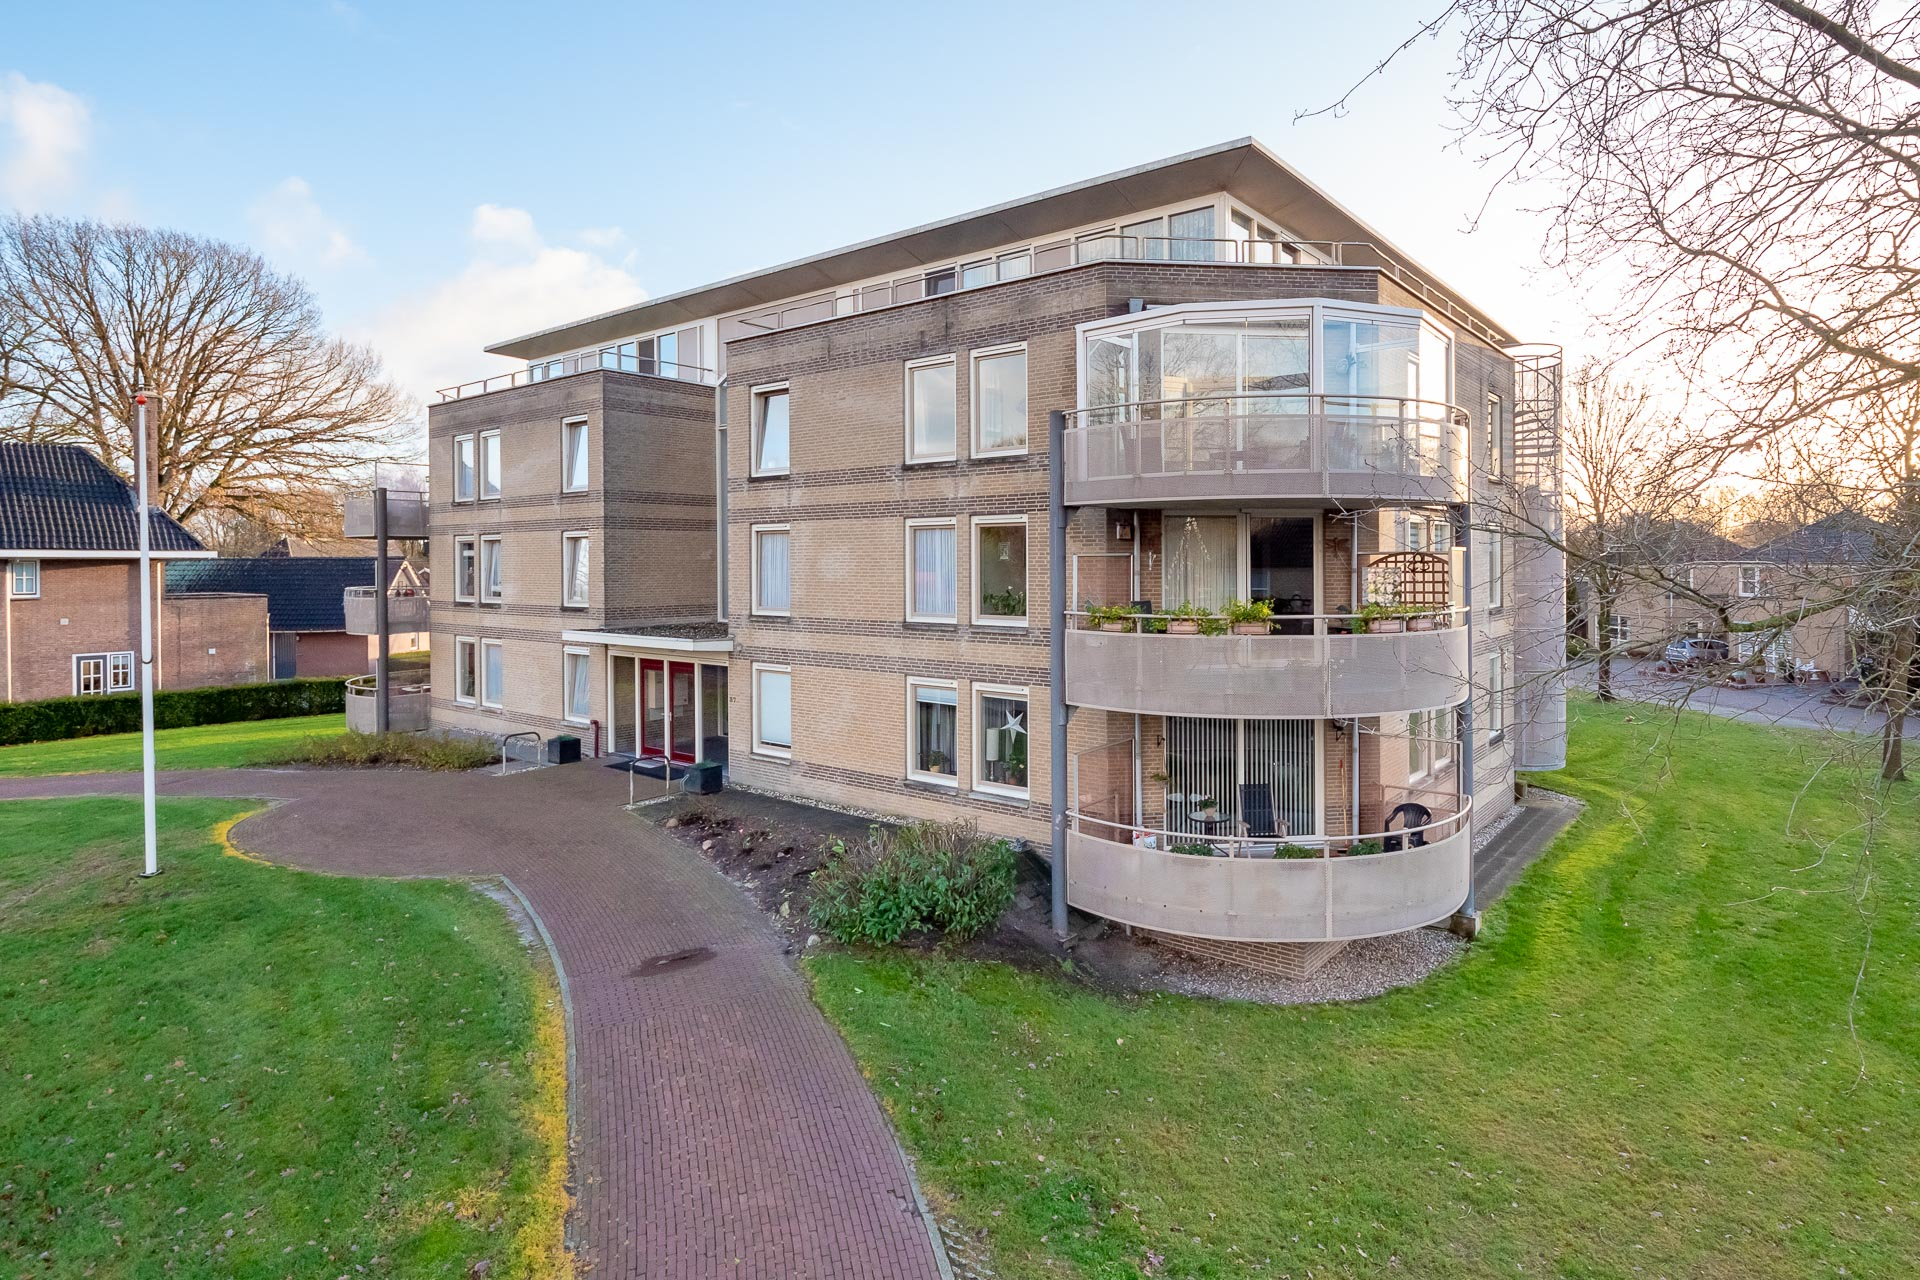 3 kamer appartement te Westerbork, Midden-Drenthe